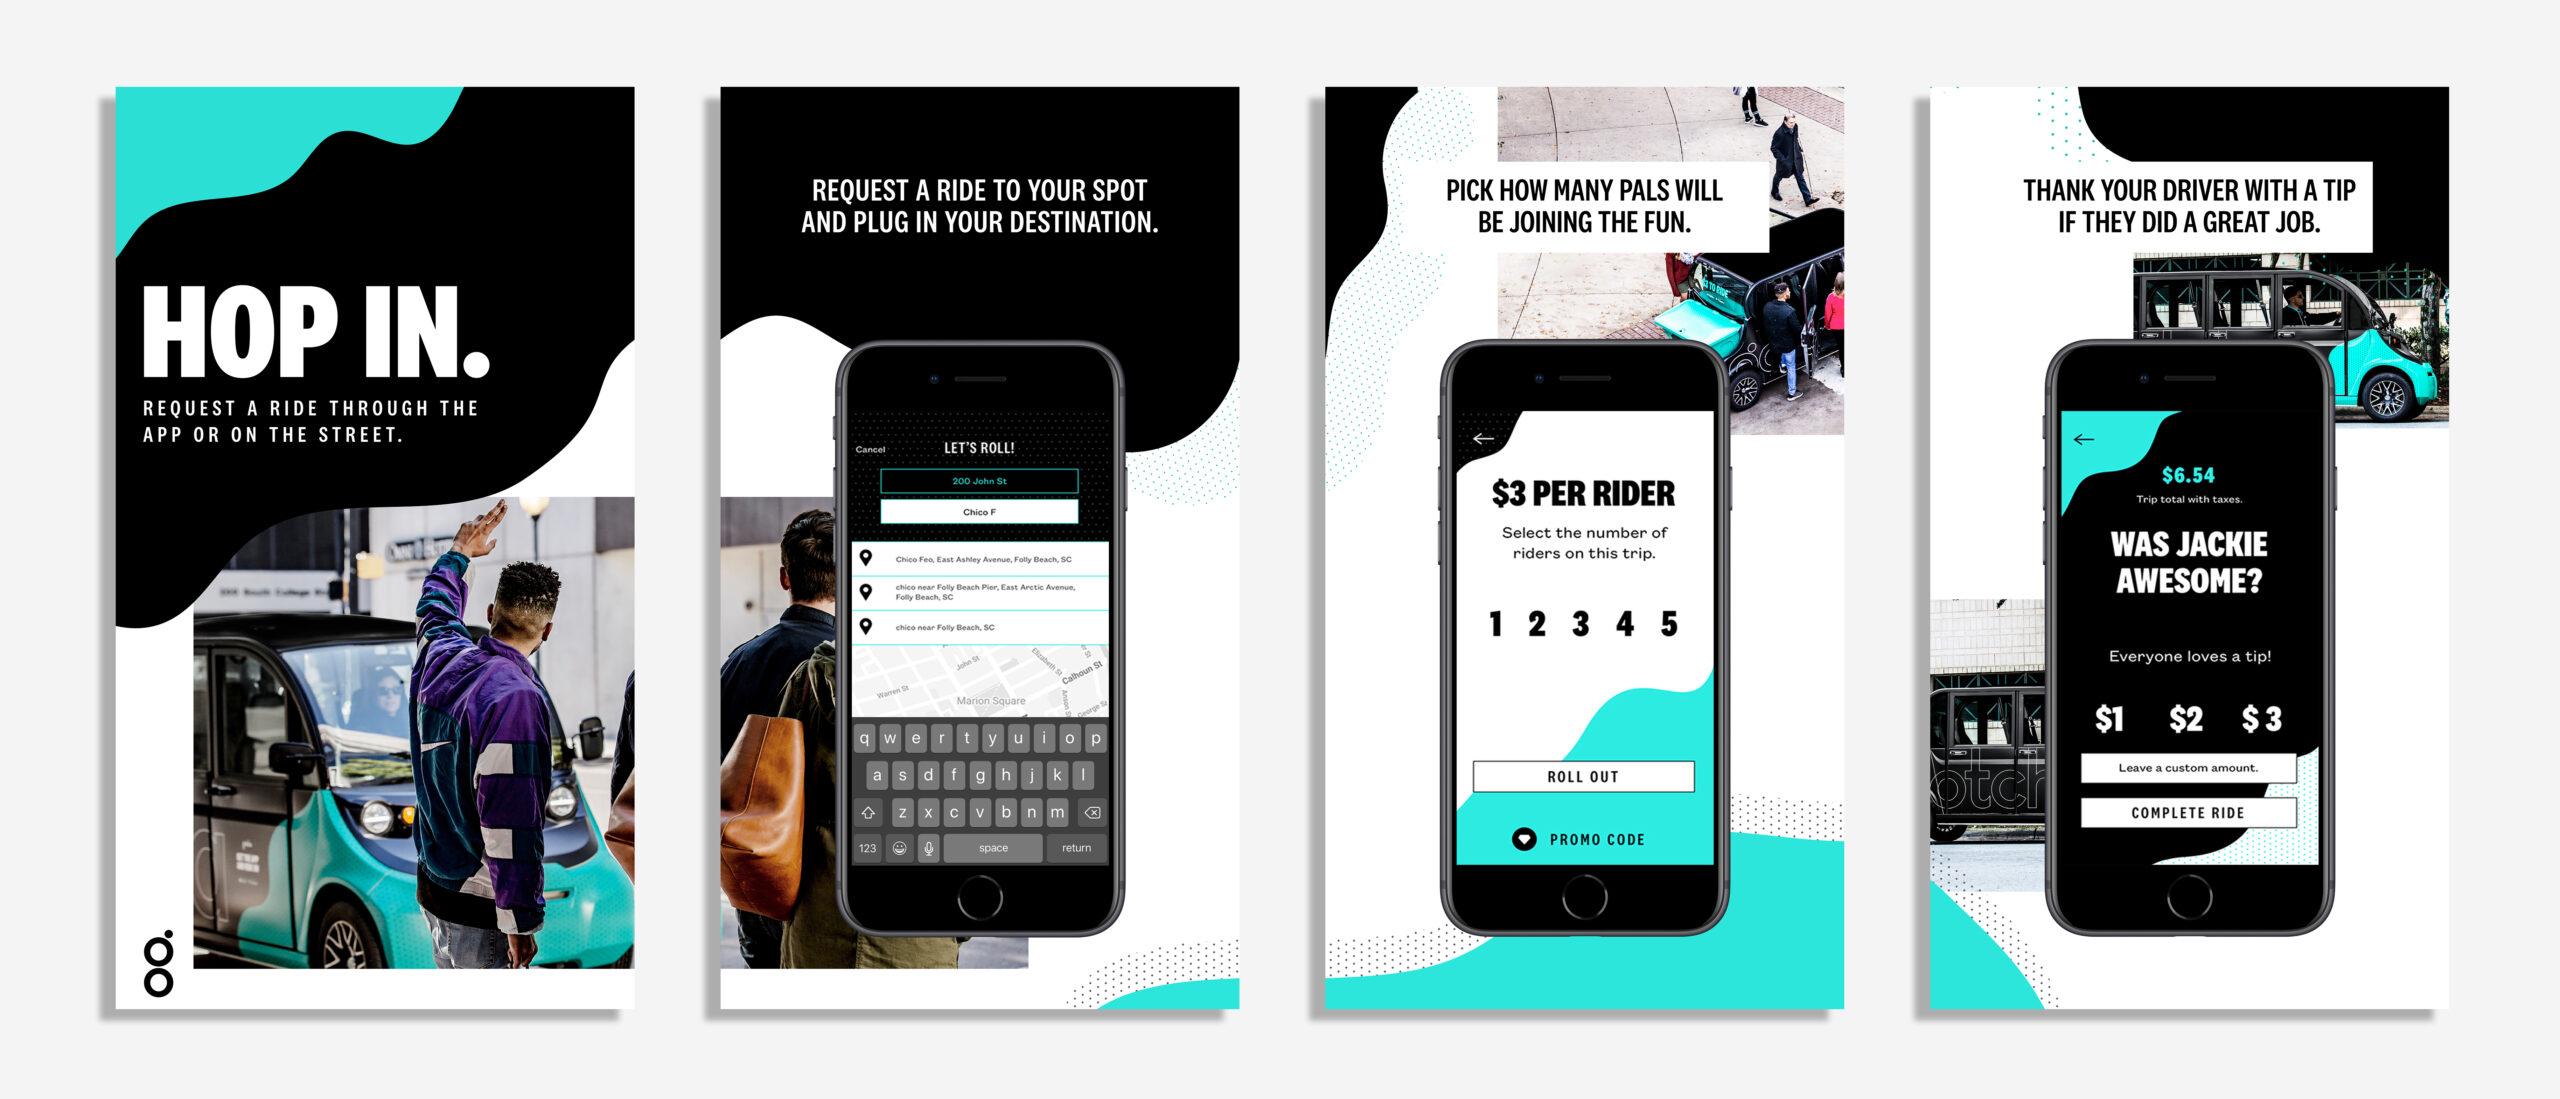 Gotcha's ride app store preview image